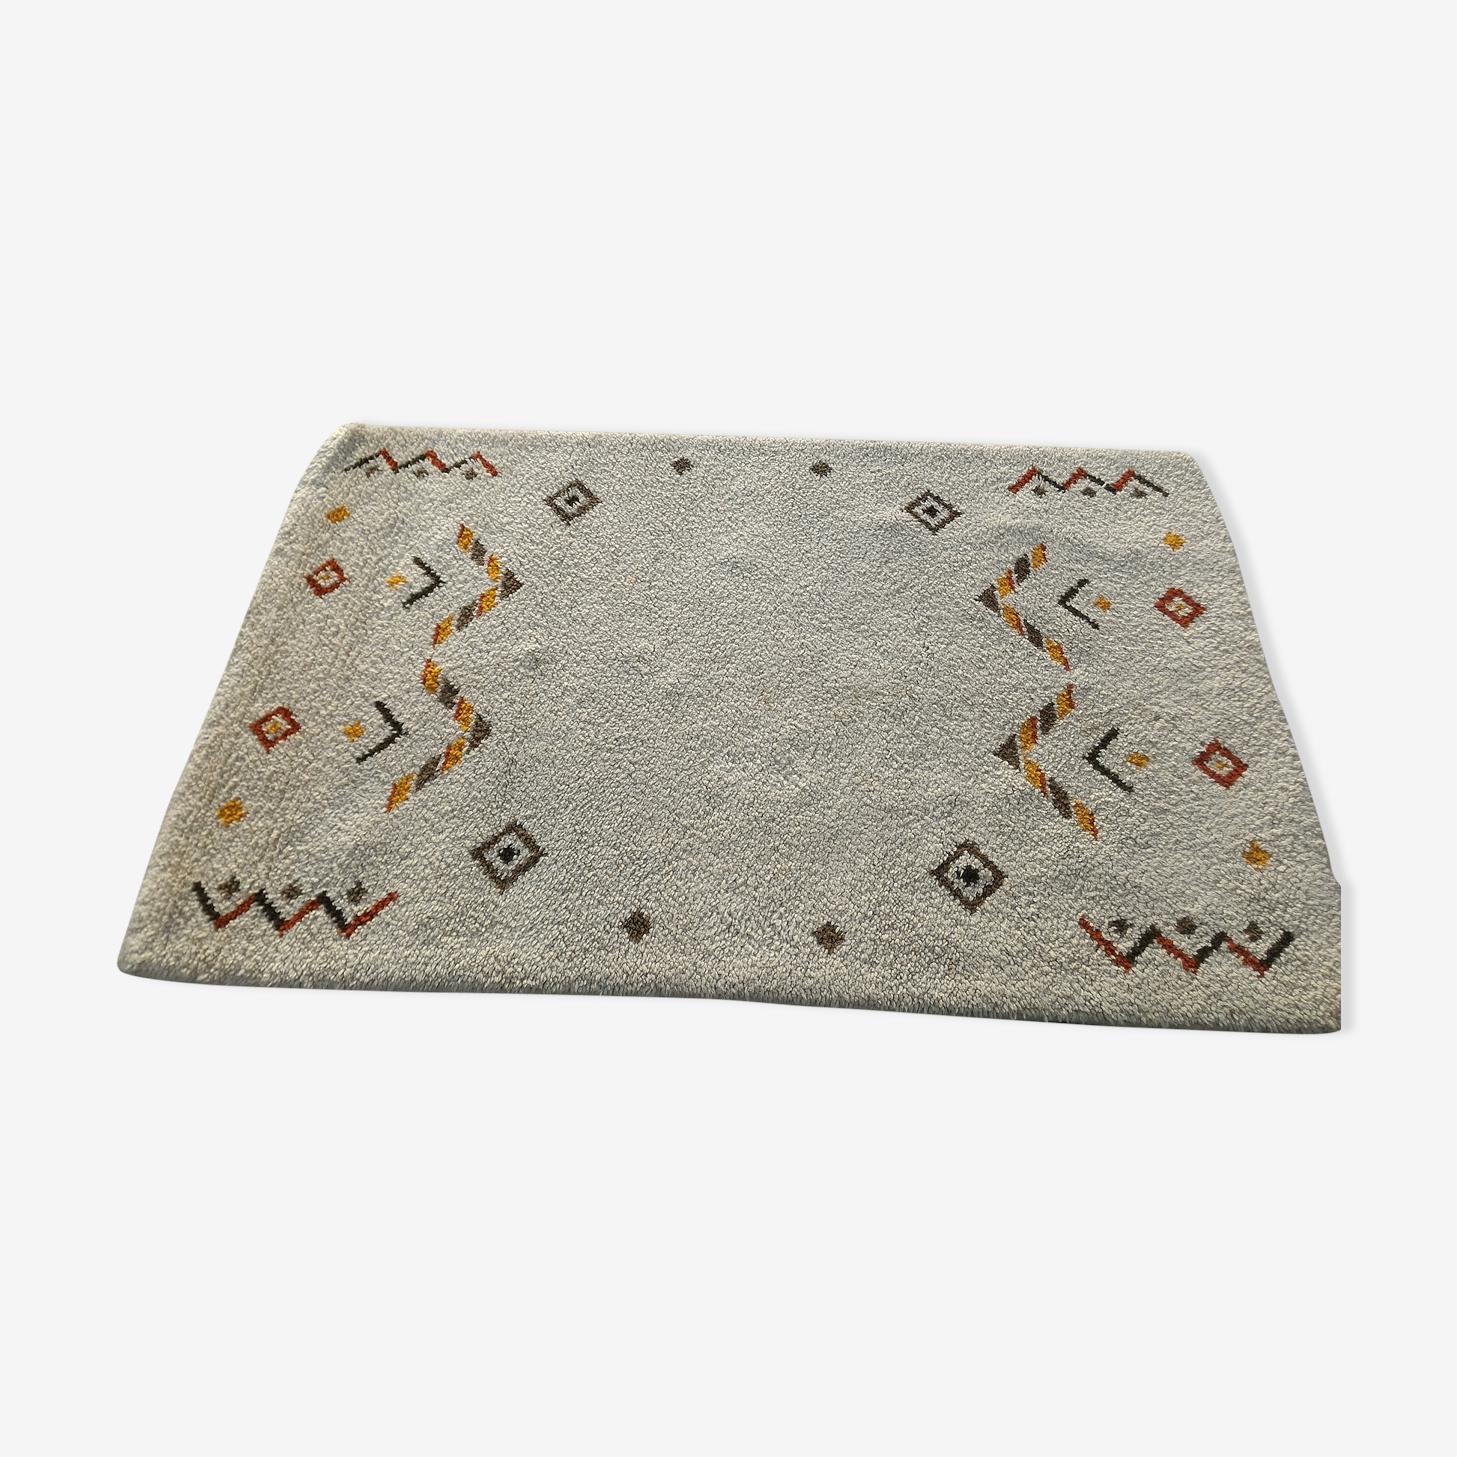 Tapis marocain en laine 160x90 cm